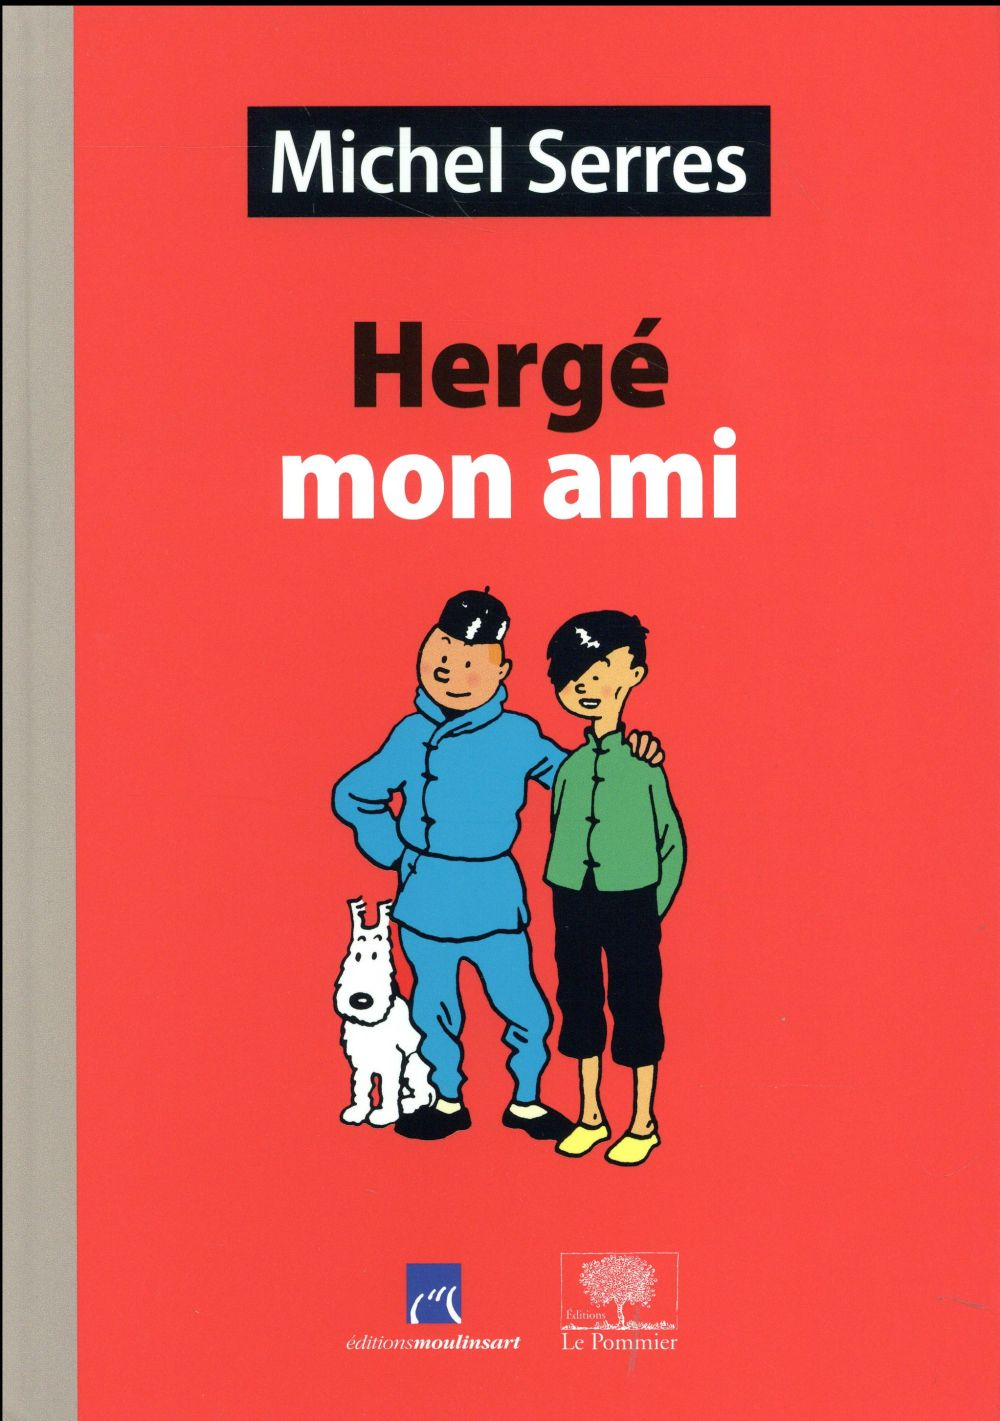 HERGE MON AMI